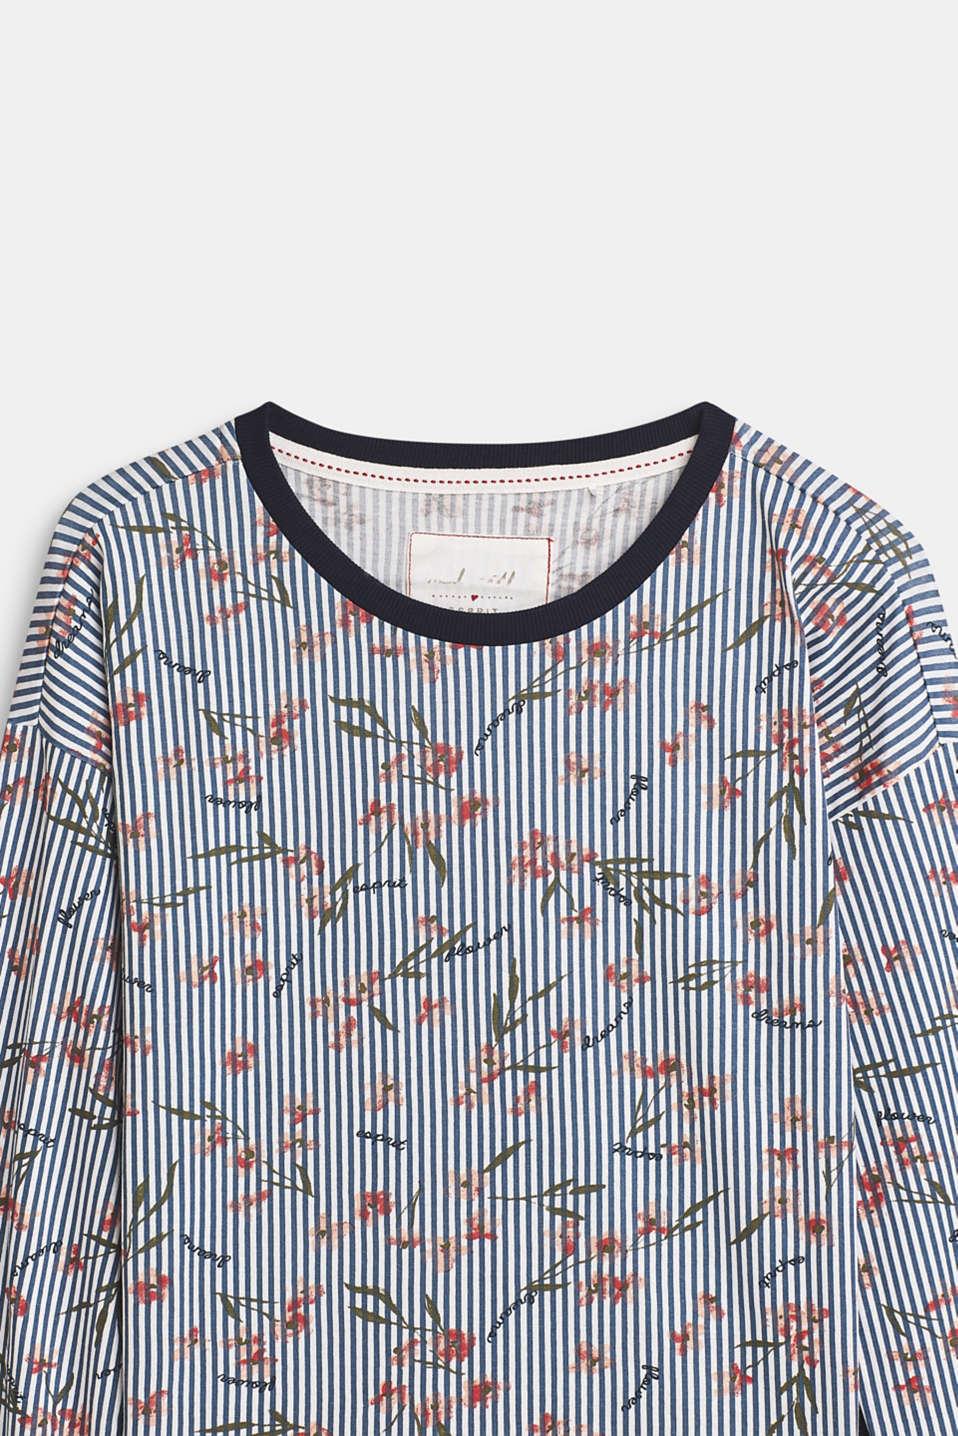 Printed jersey pyjamas, 100% cotton, NAVY, detail image number 3